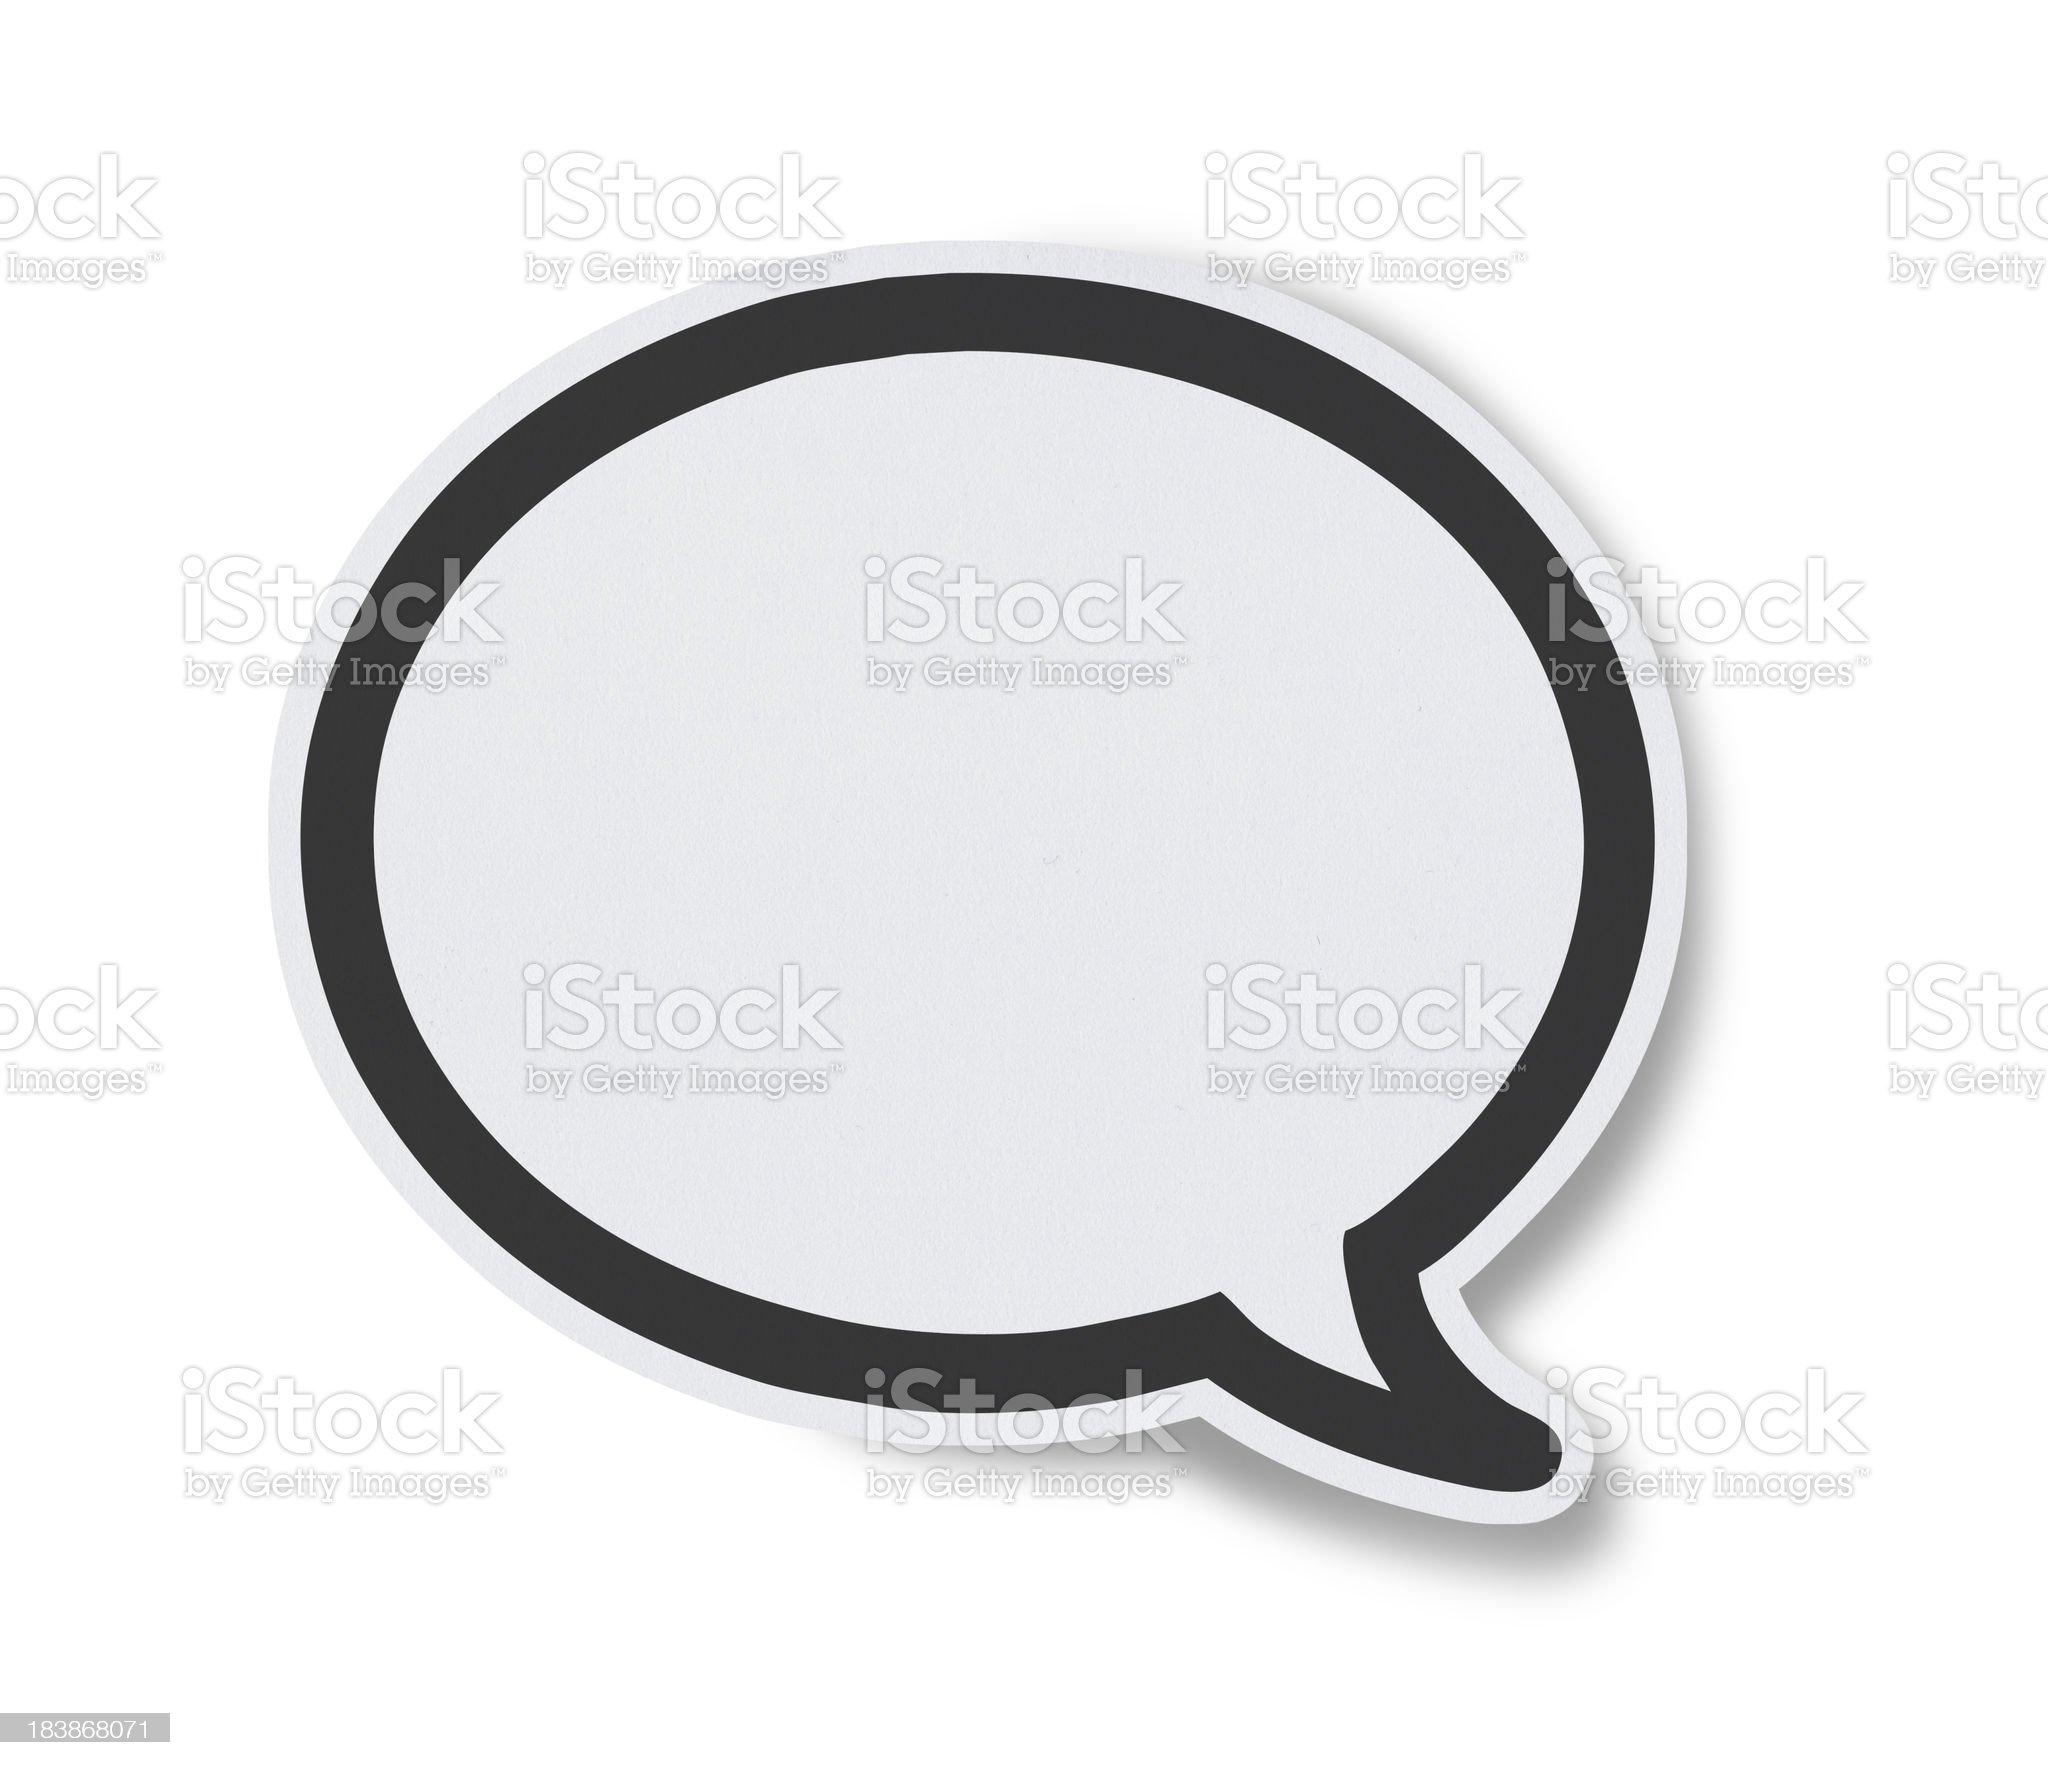 Blank White Speech Bubbles royalty-free stock photo